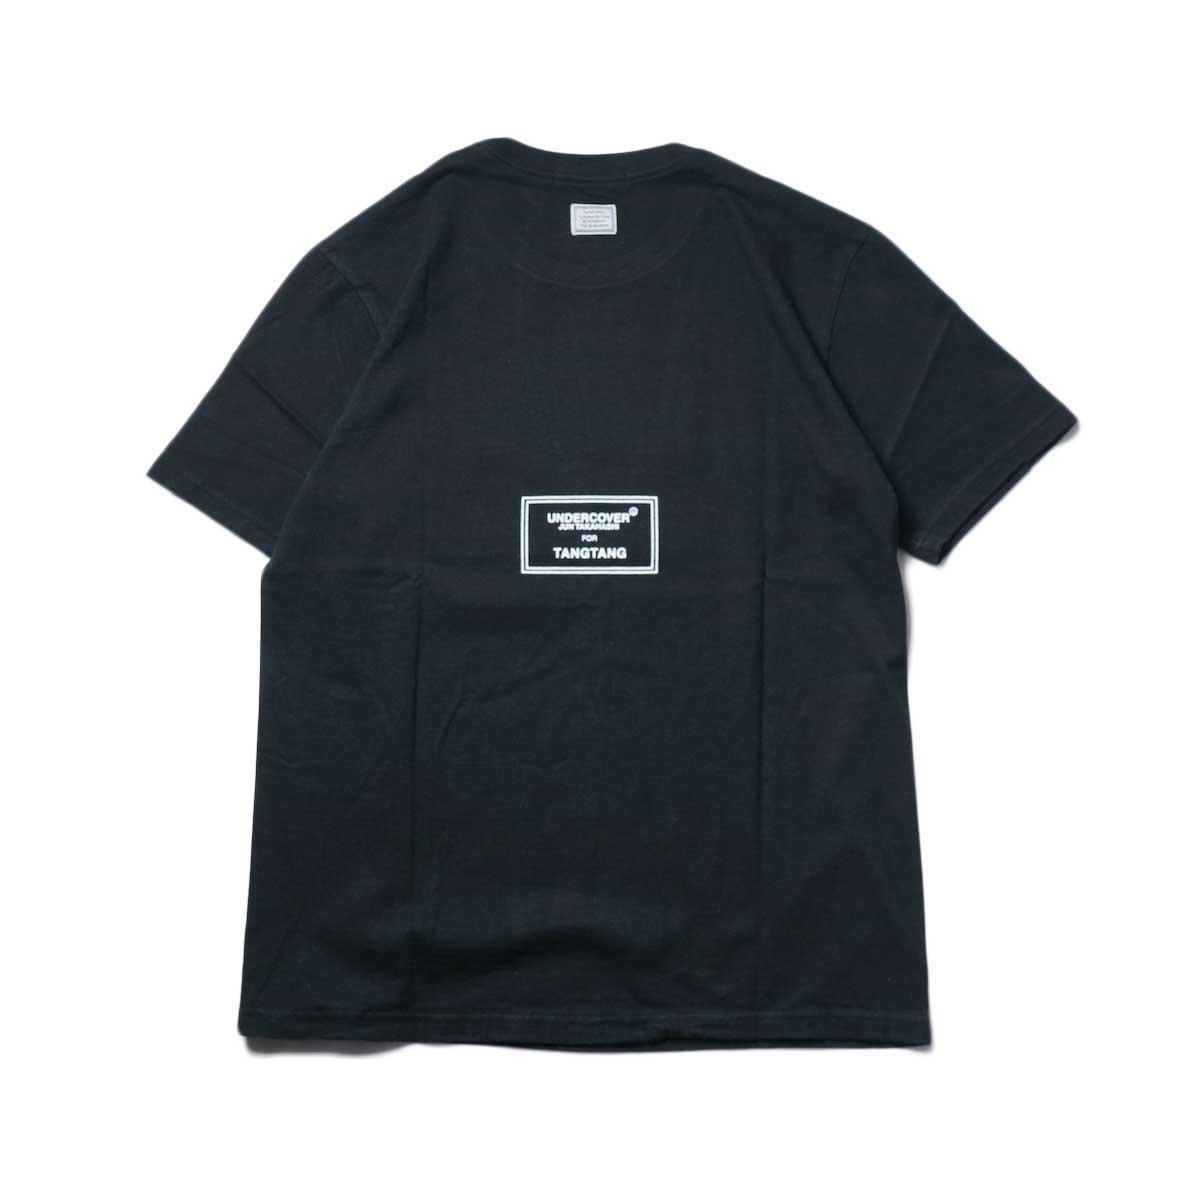 TANGTANG / UNDERCOVER -ALWAYS (Black)背面